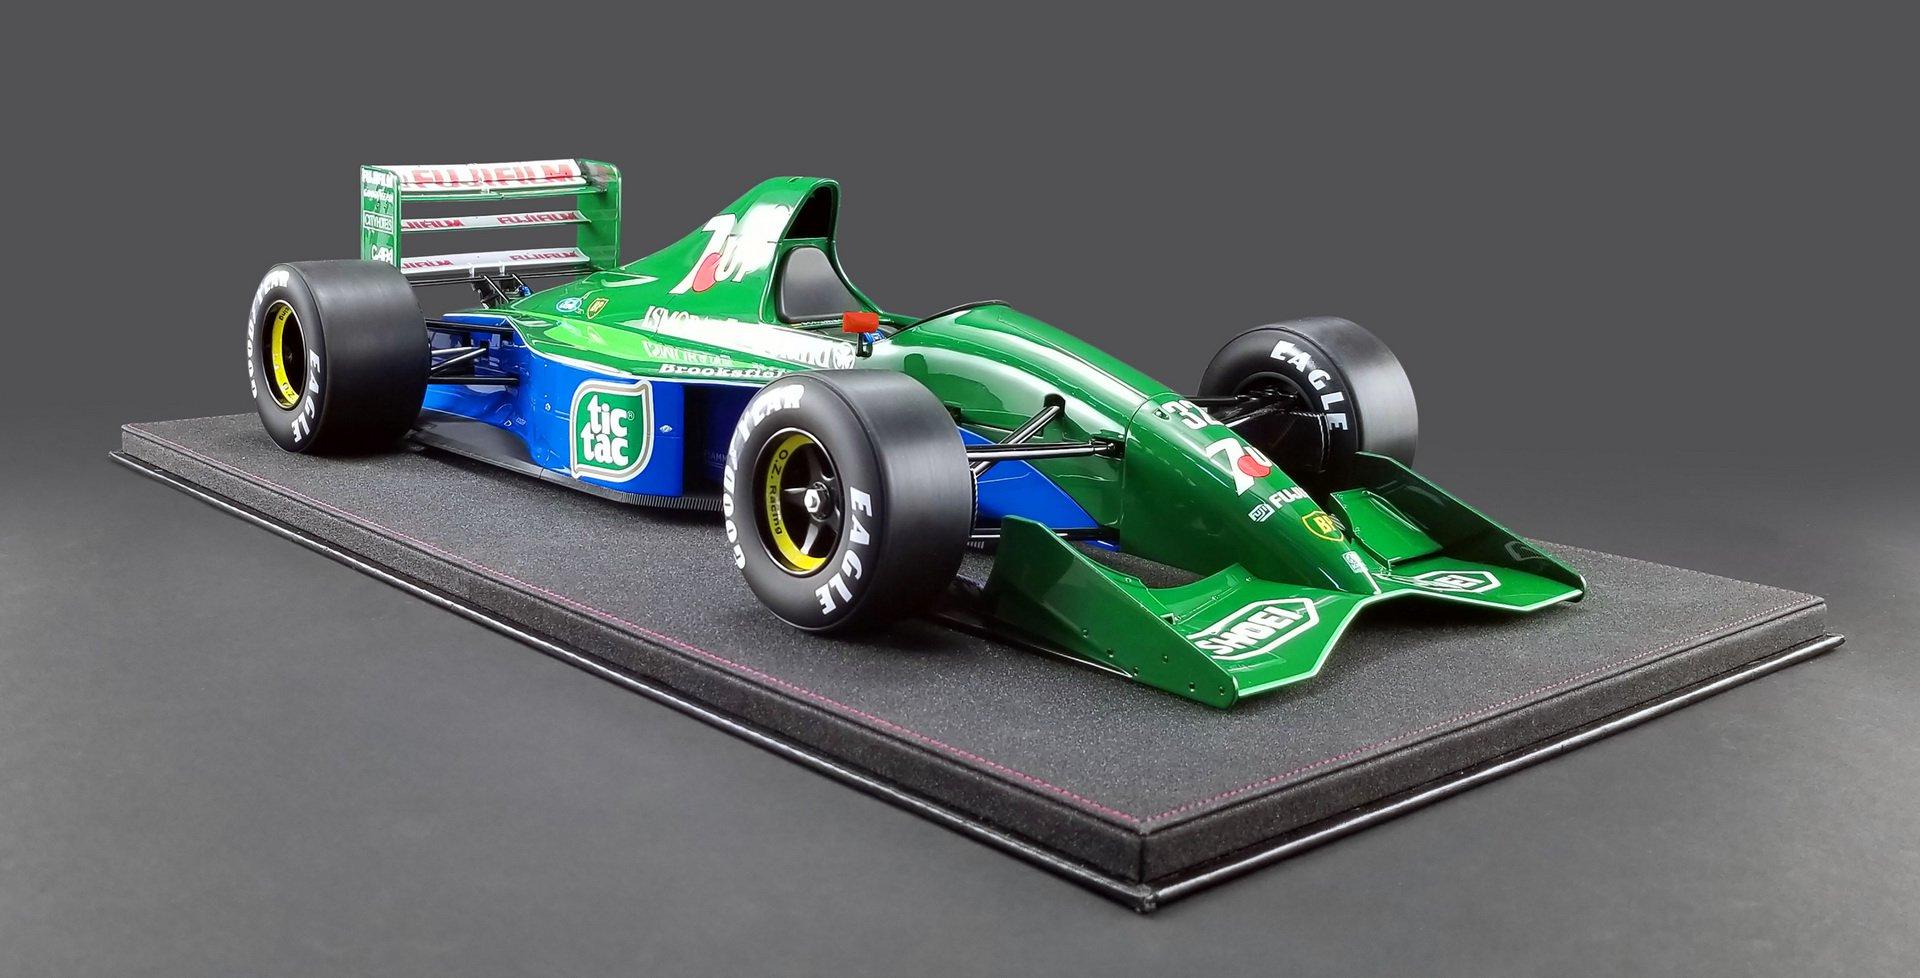 1991_Jordan_F1_car_Schumacher_scale_0007